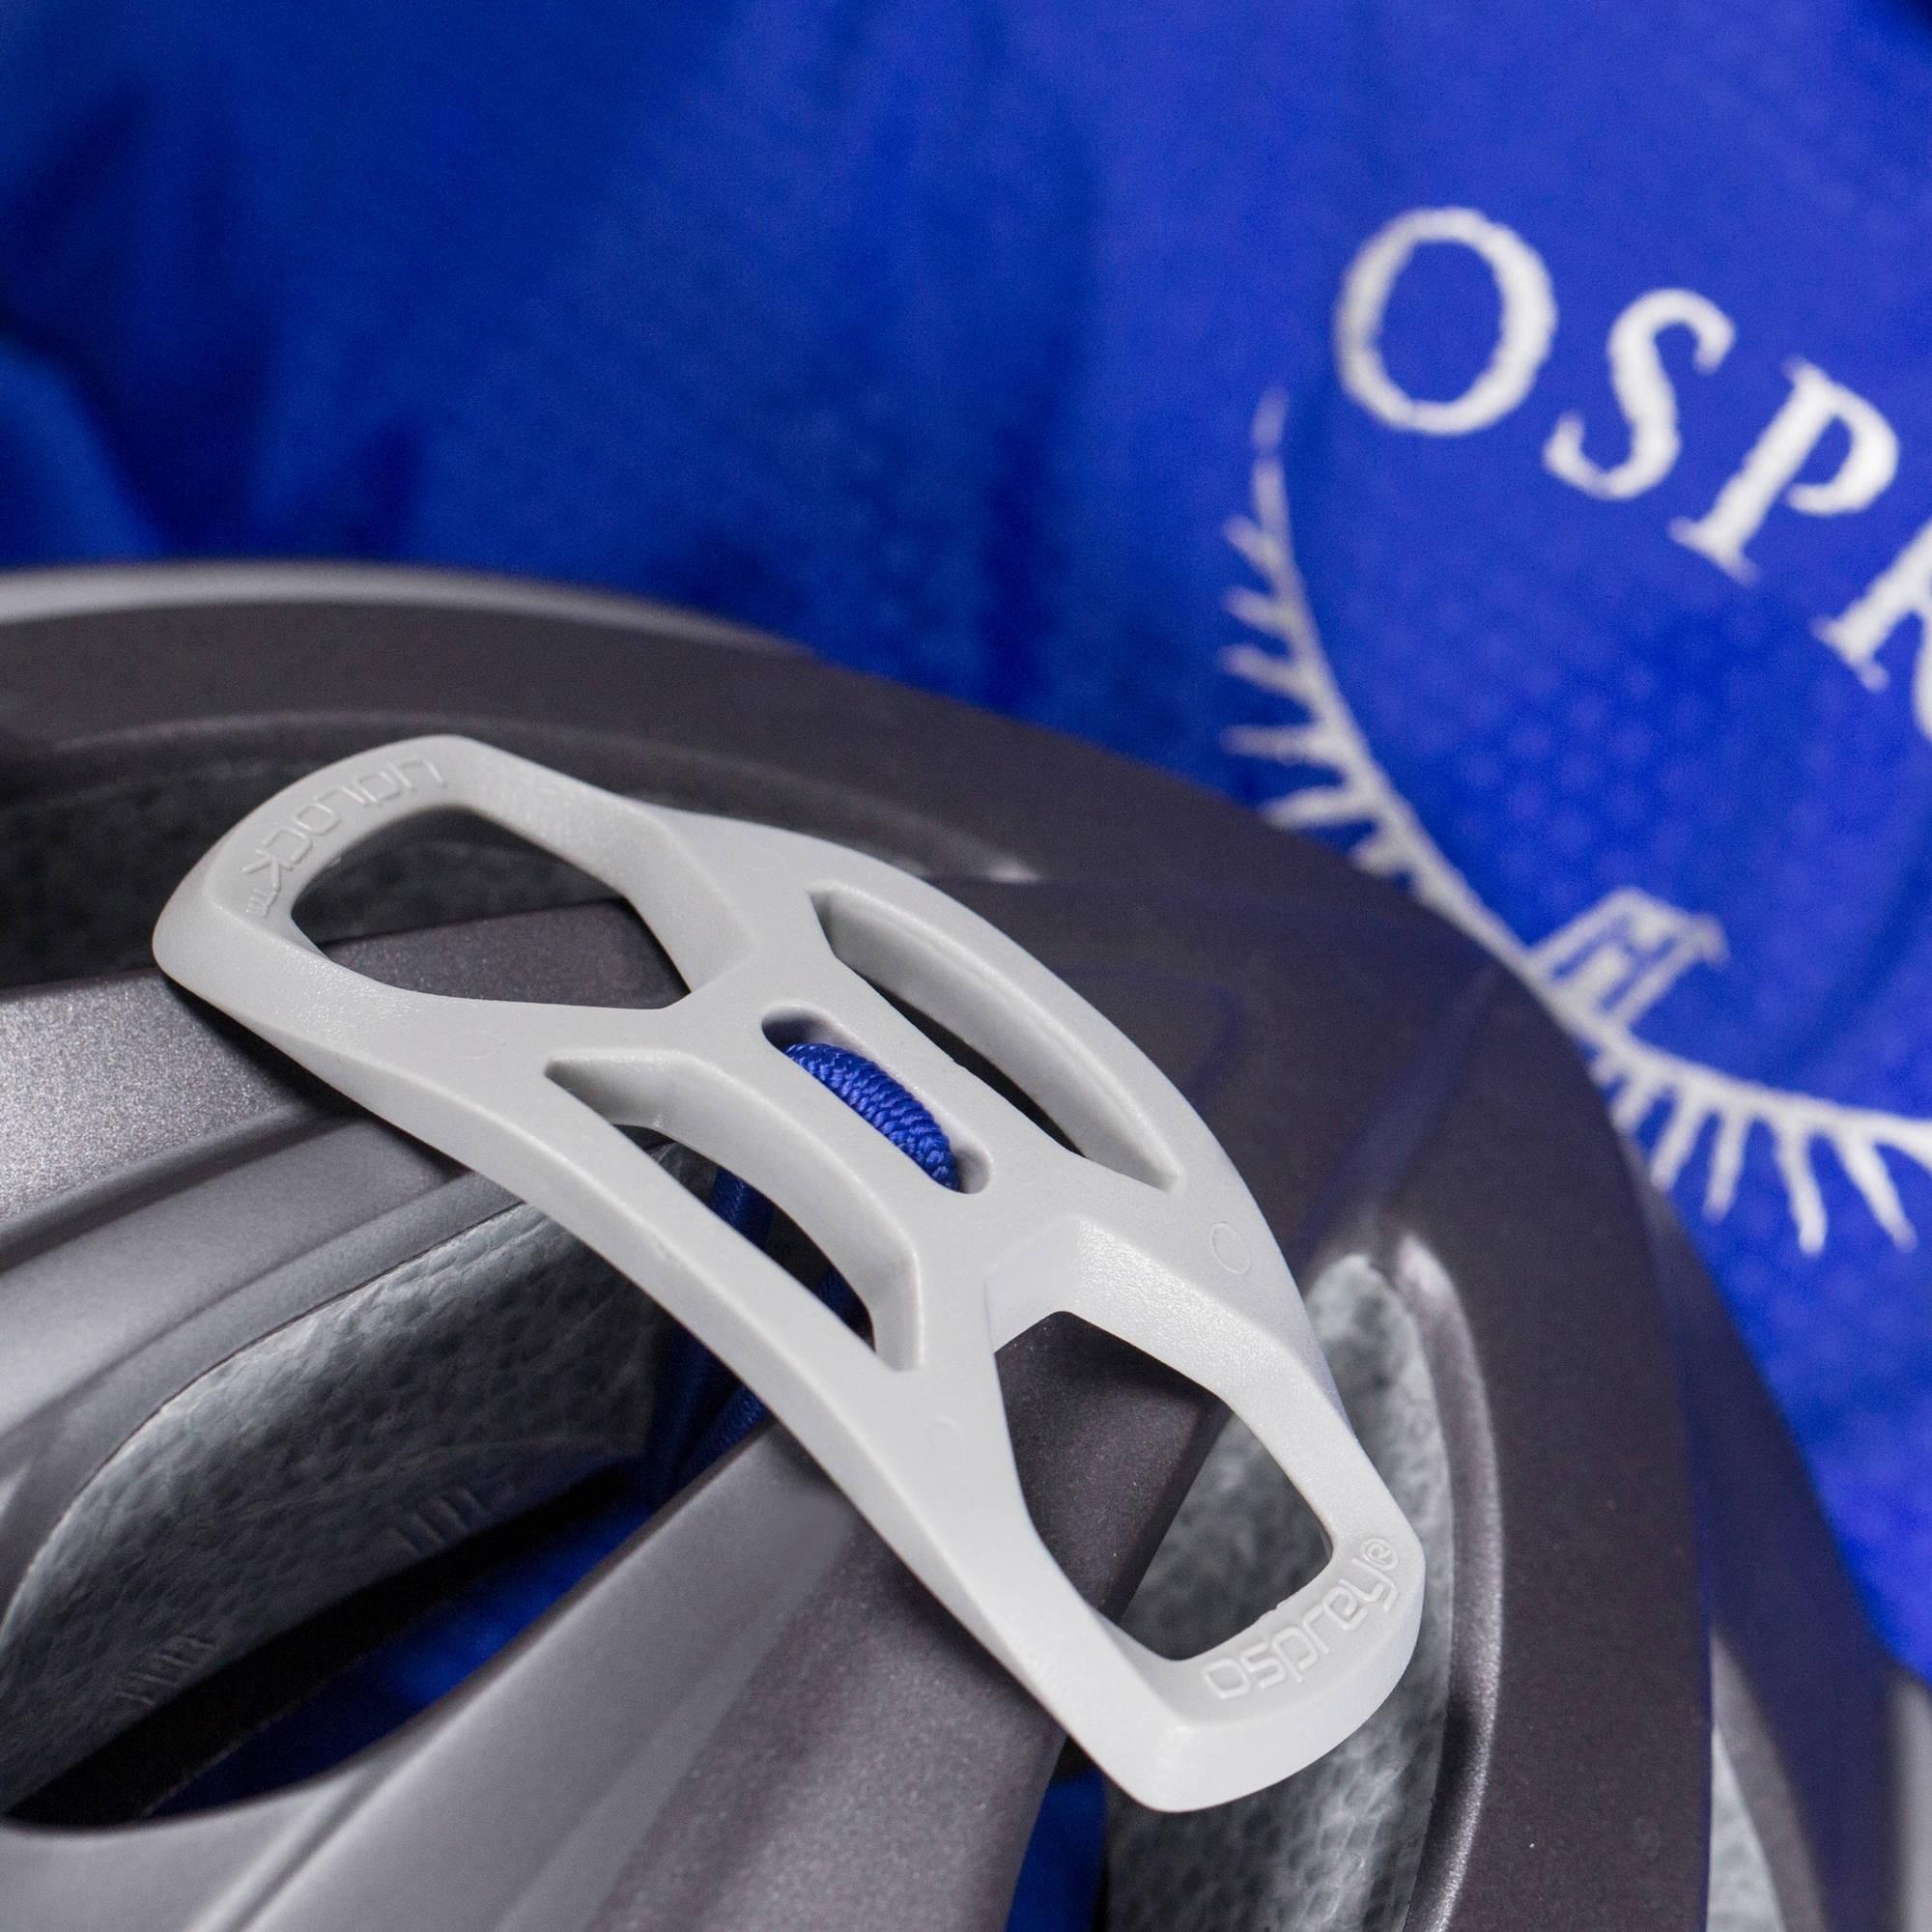 Osprey Tempest 20 Women's Rucksack - Iris Blue